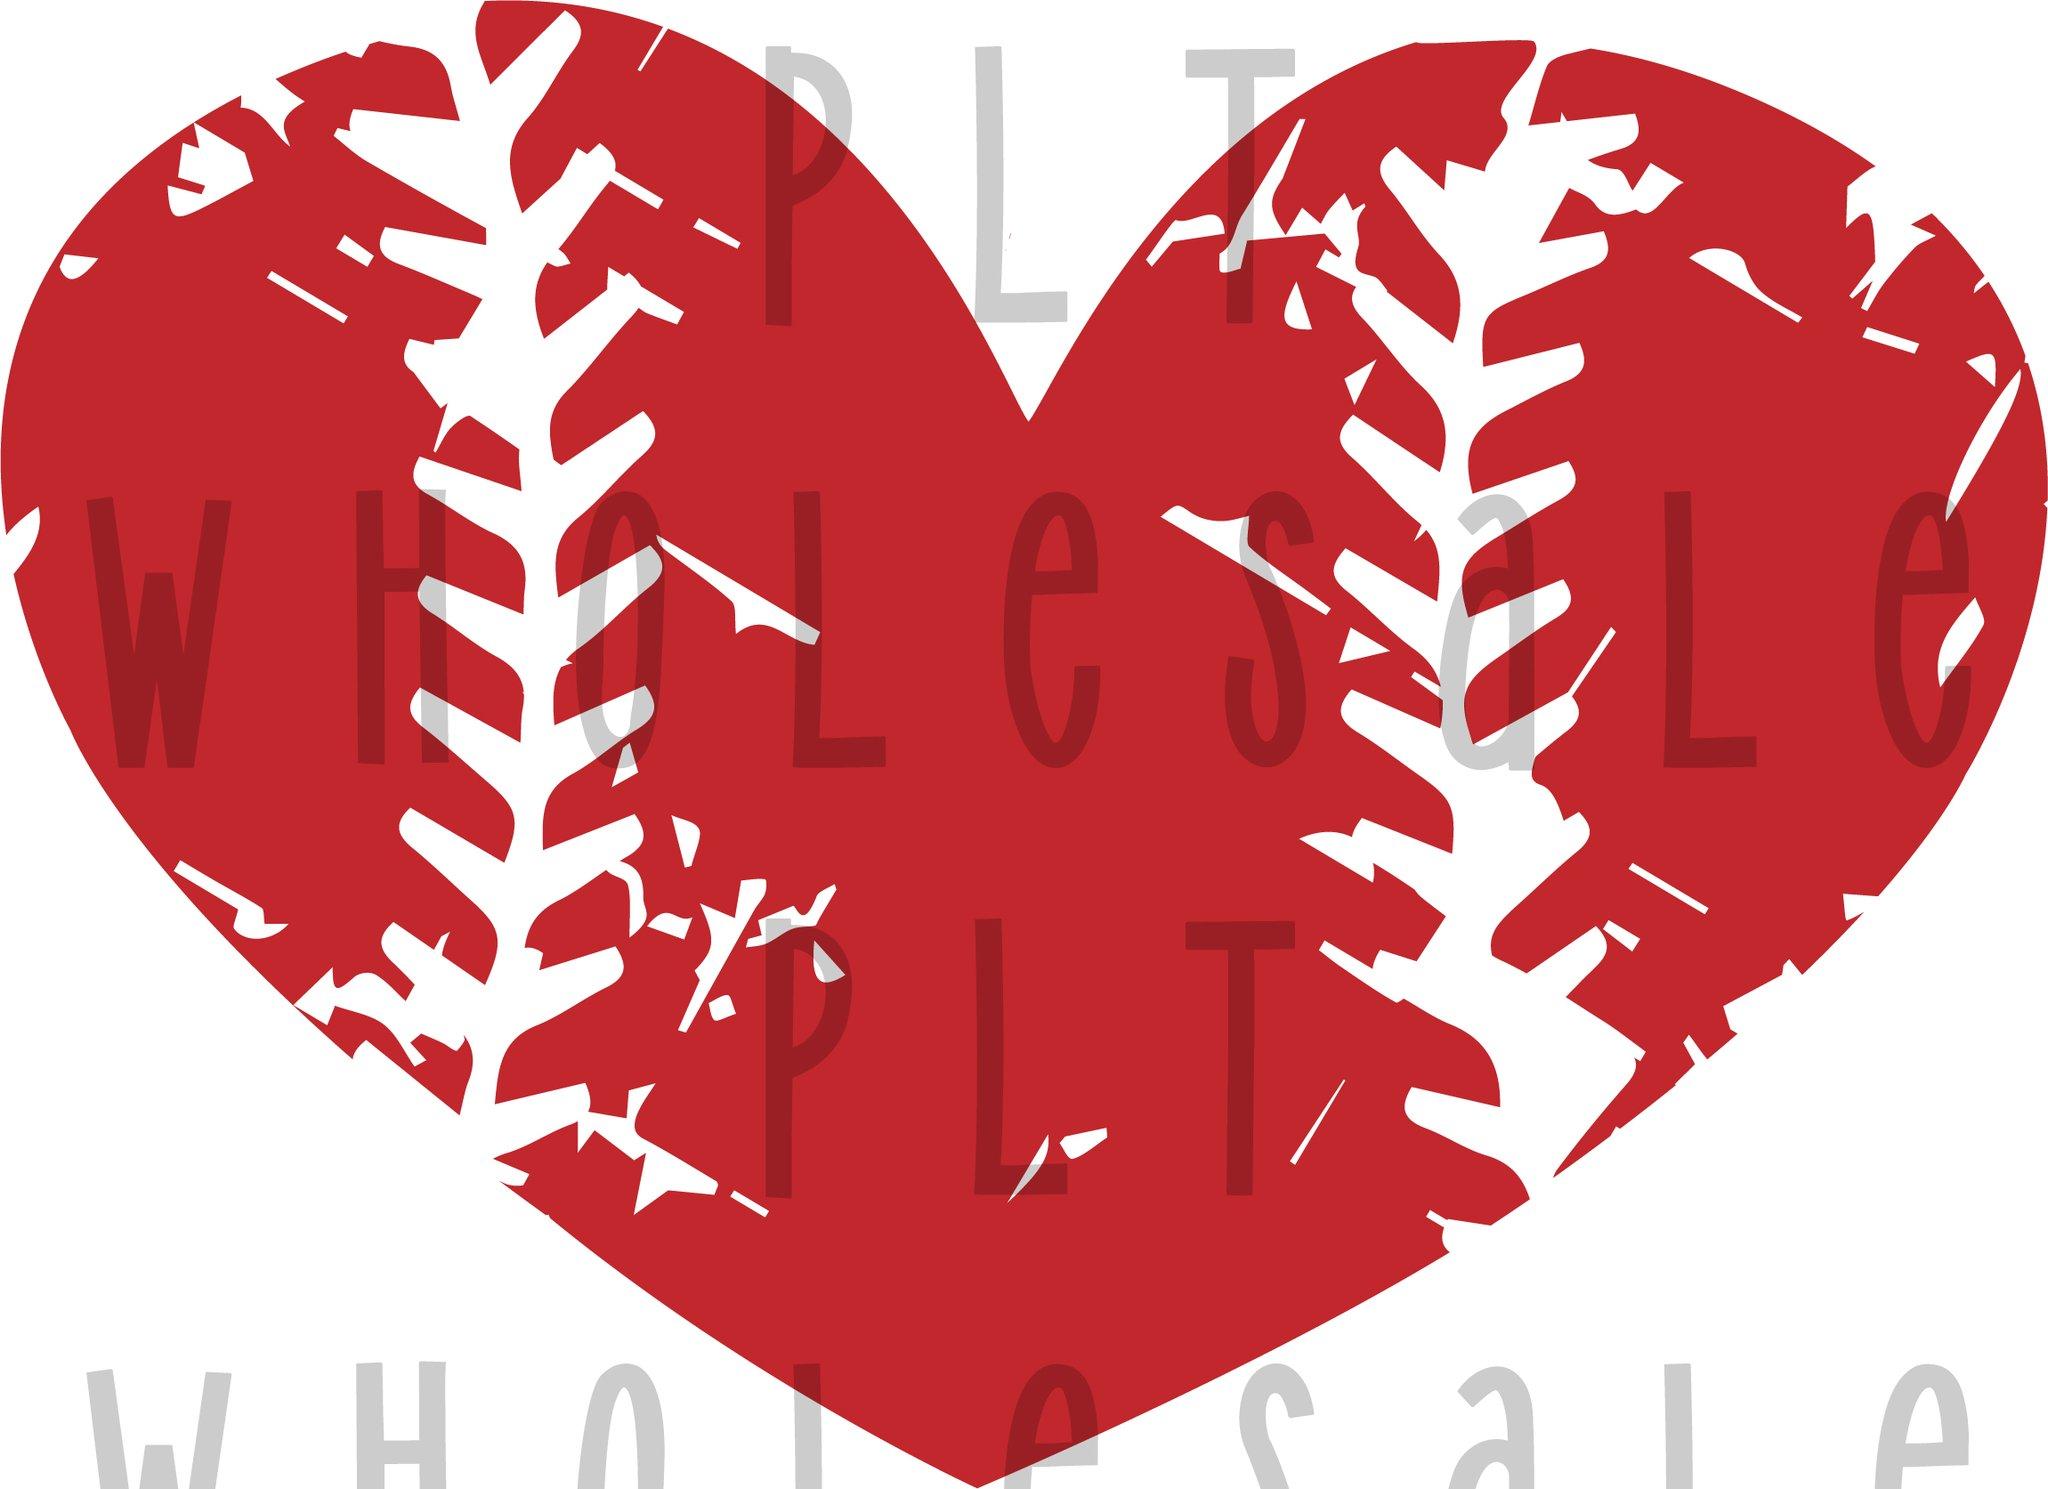 Distressedbaseball clipart clipart freeuse download Distressed Baseball Heart - Dye Sub Heat Transfer Sheet clipart freeuse download